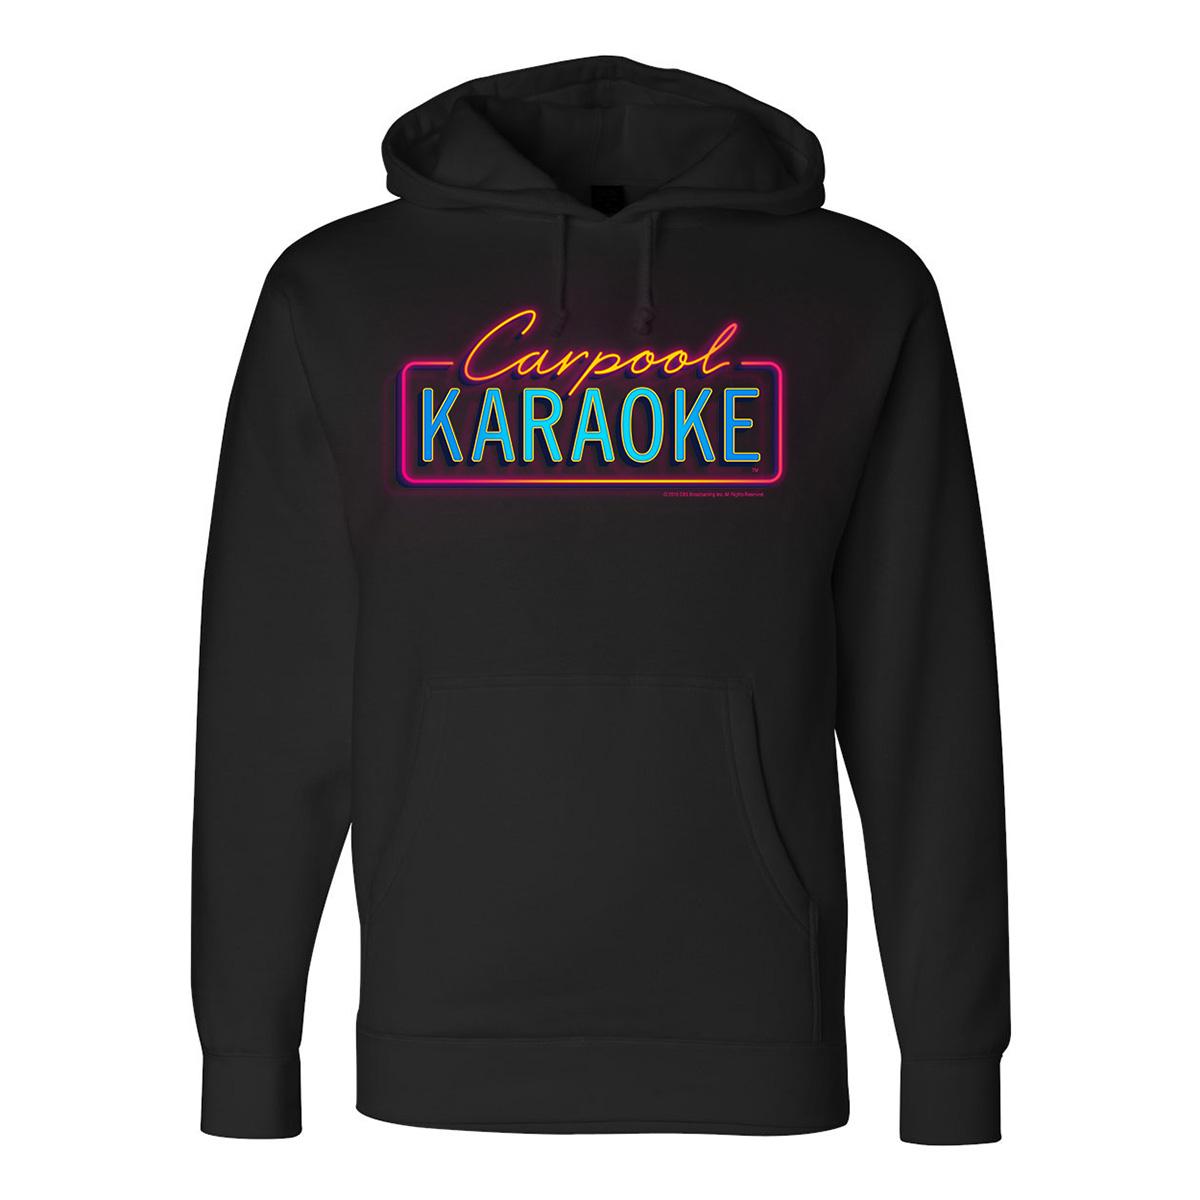 The Late Late Show with James Corden Carpool Karaoke Neon Logo Hoodie